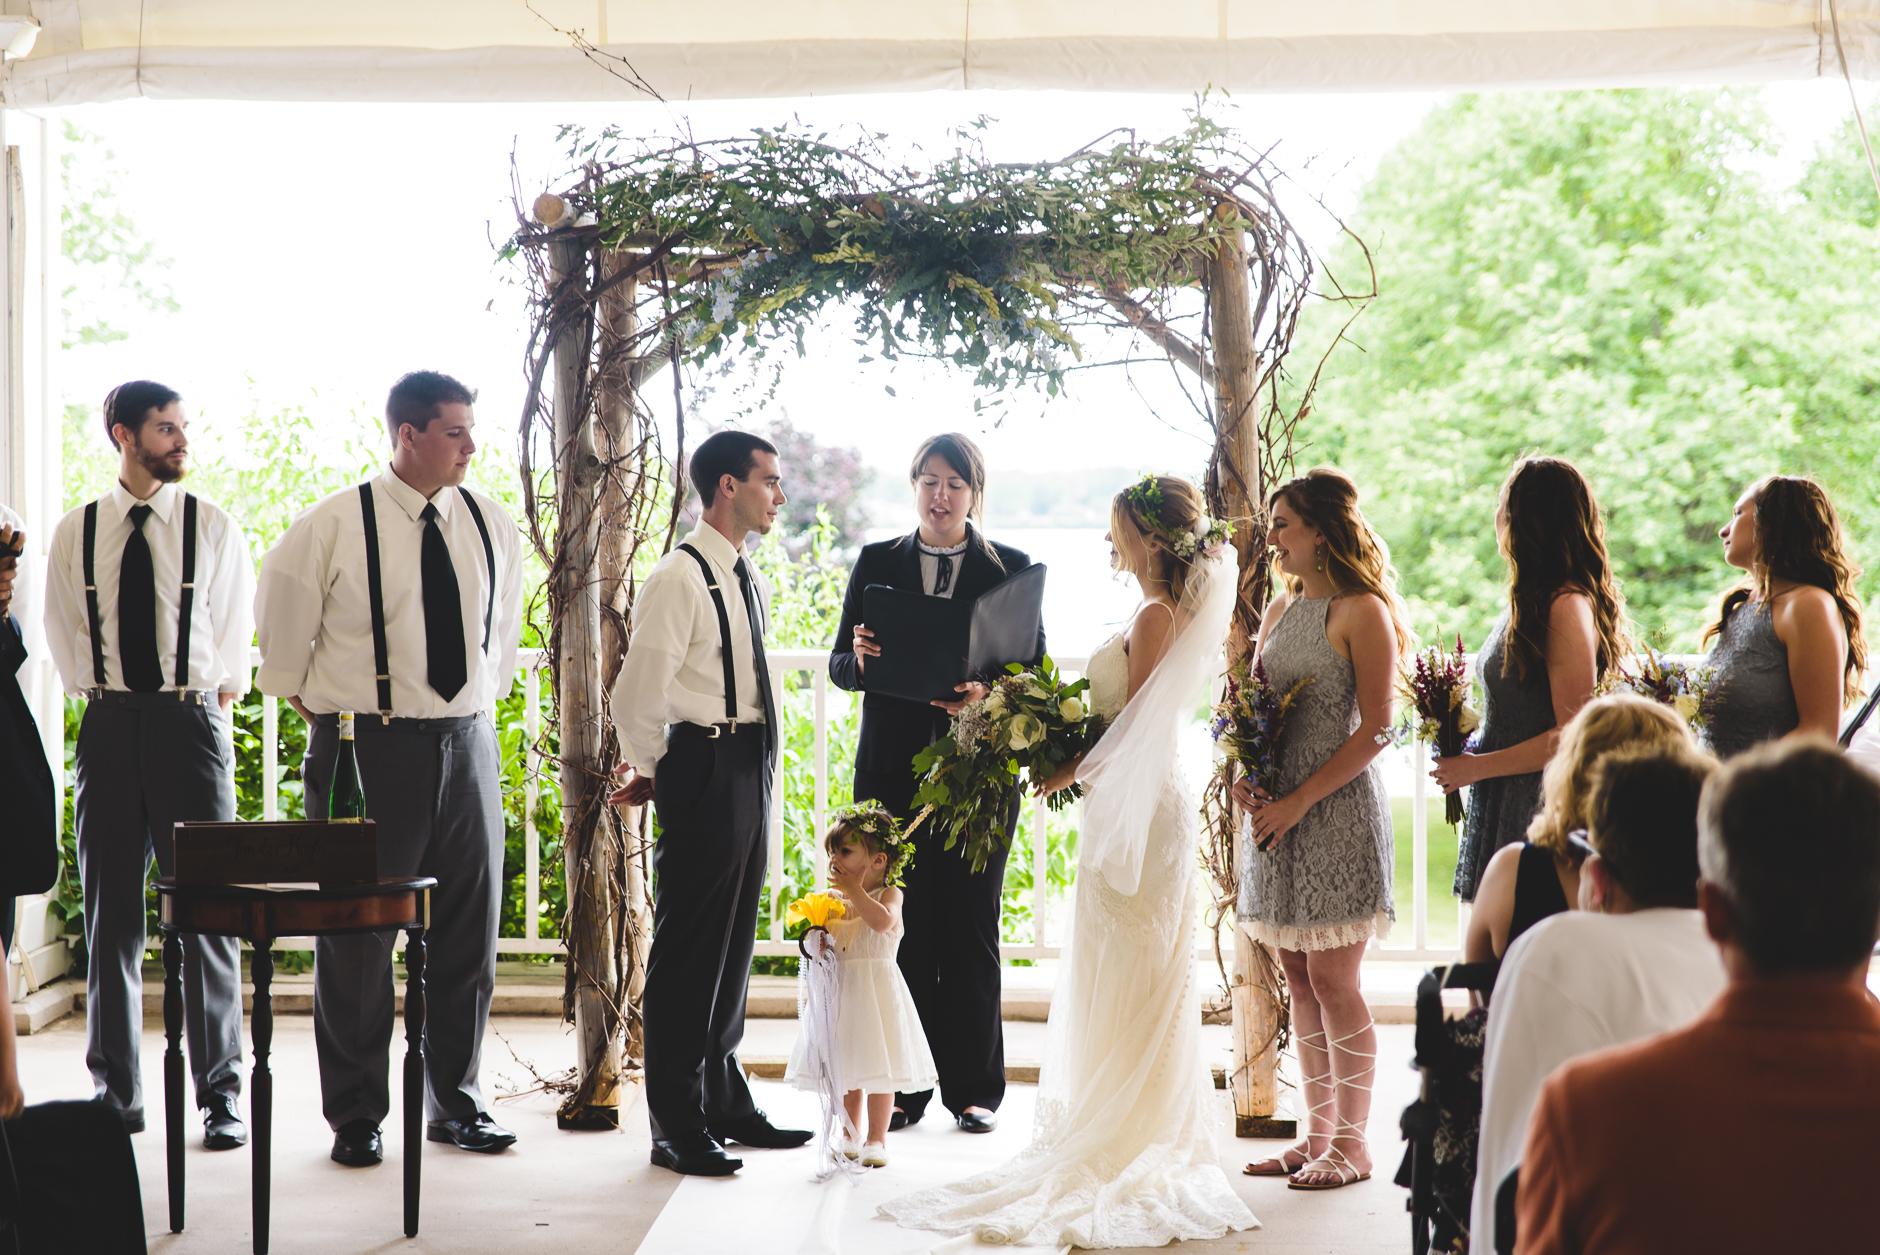 Best_Buffalo_NY_Wedding_photographer_069.jpg